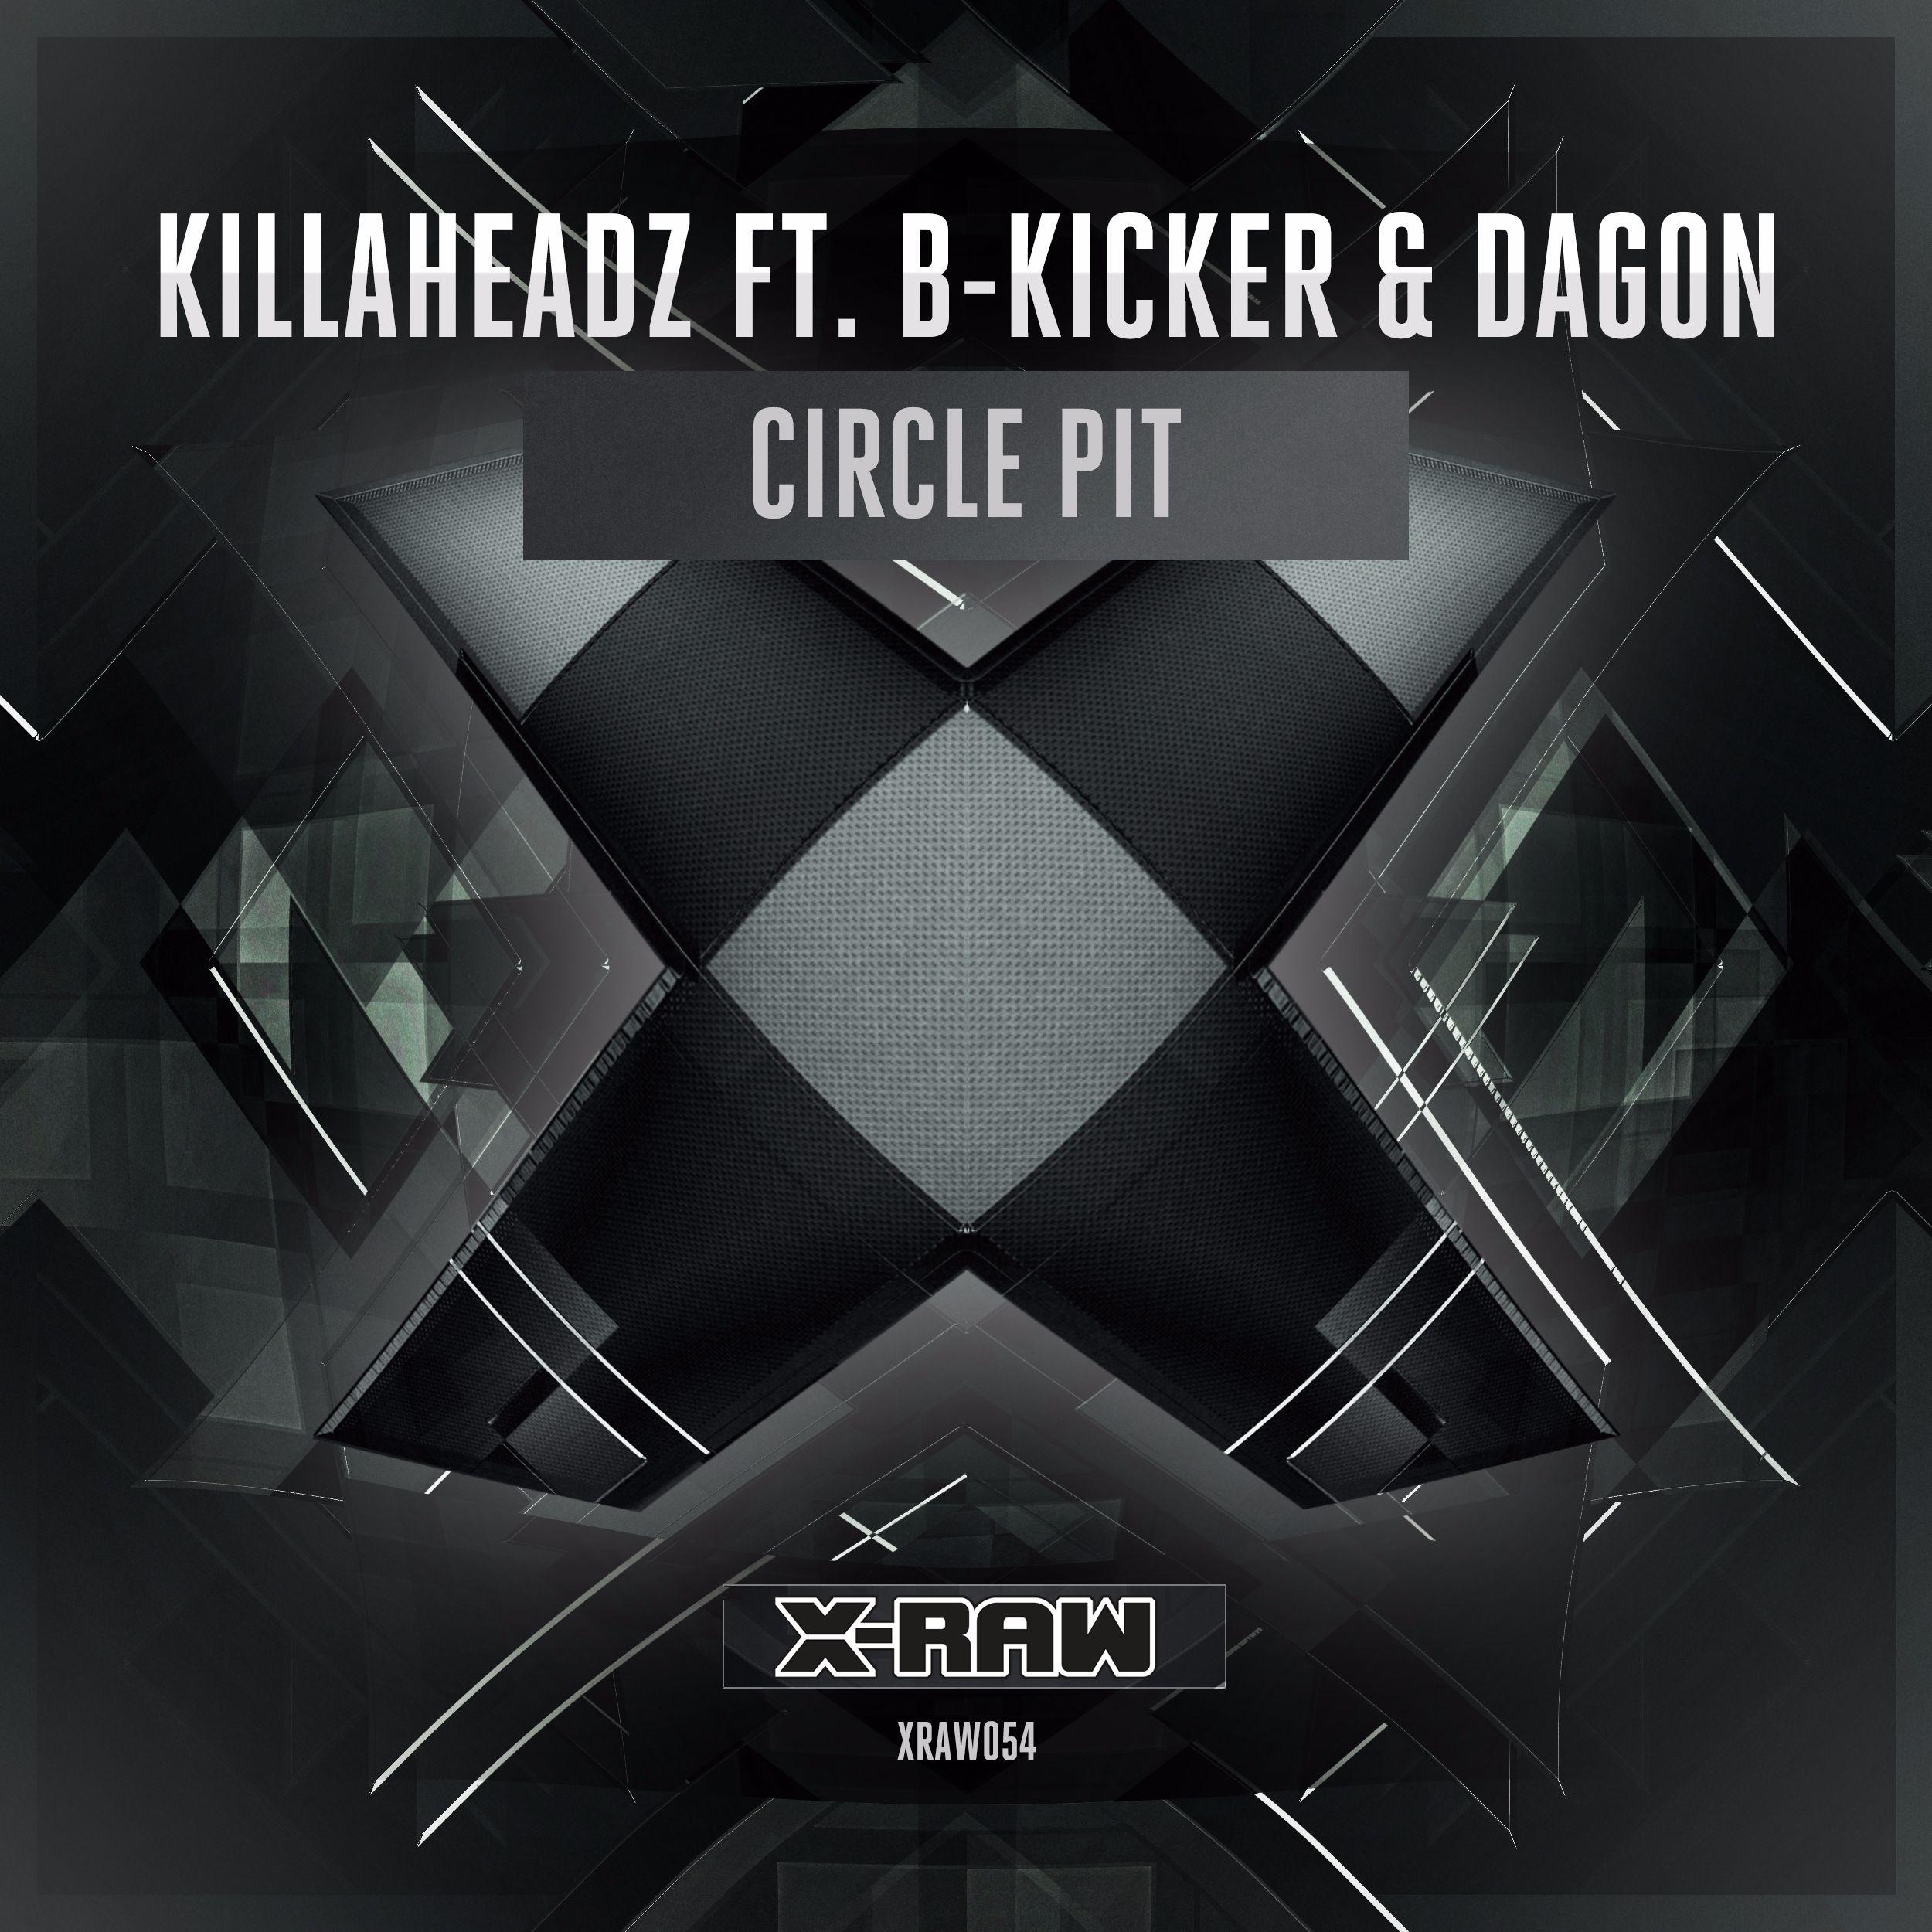 Killaheadz Ft. B-Kicker & Dagon - Circle Pit [X-BONE RAW] XRAW054